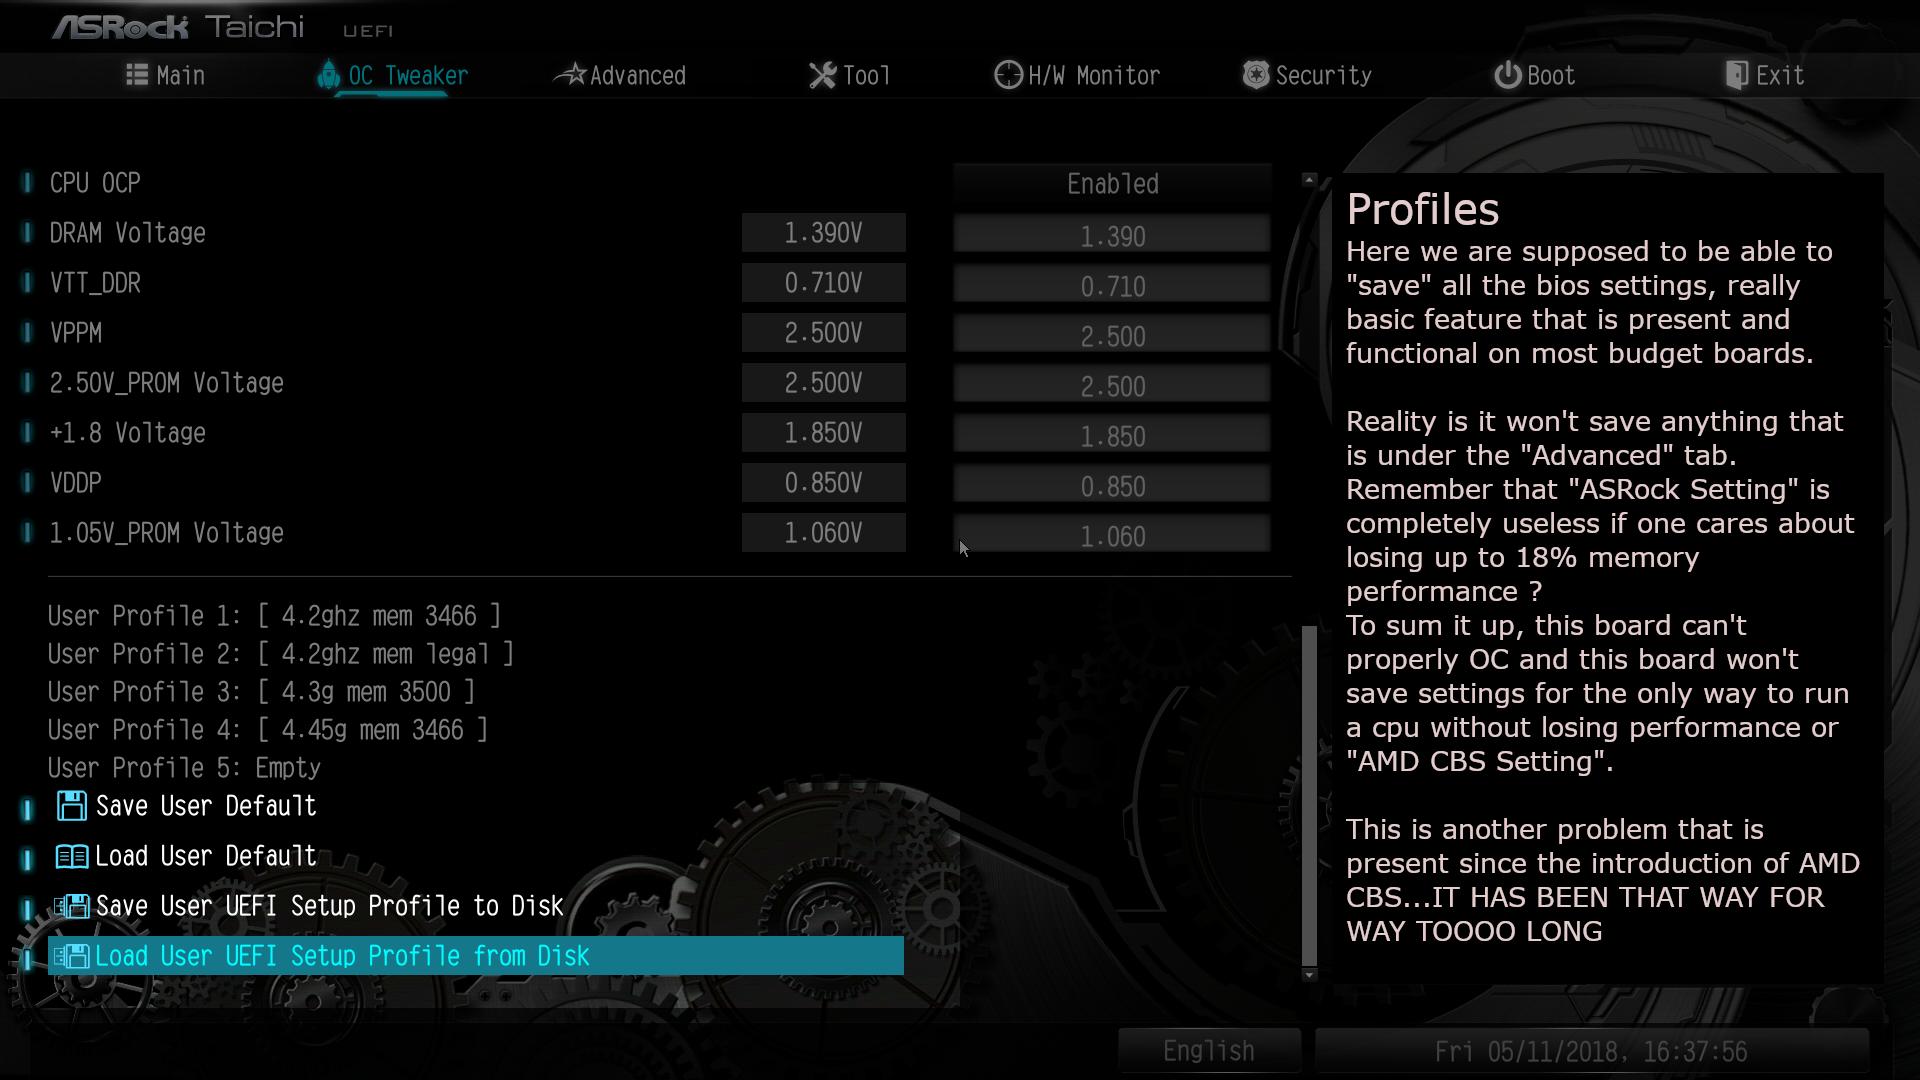 ASRock X370 Taichi (AMD AM4) | Page 4 | TechPowerUp Forums